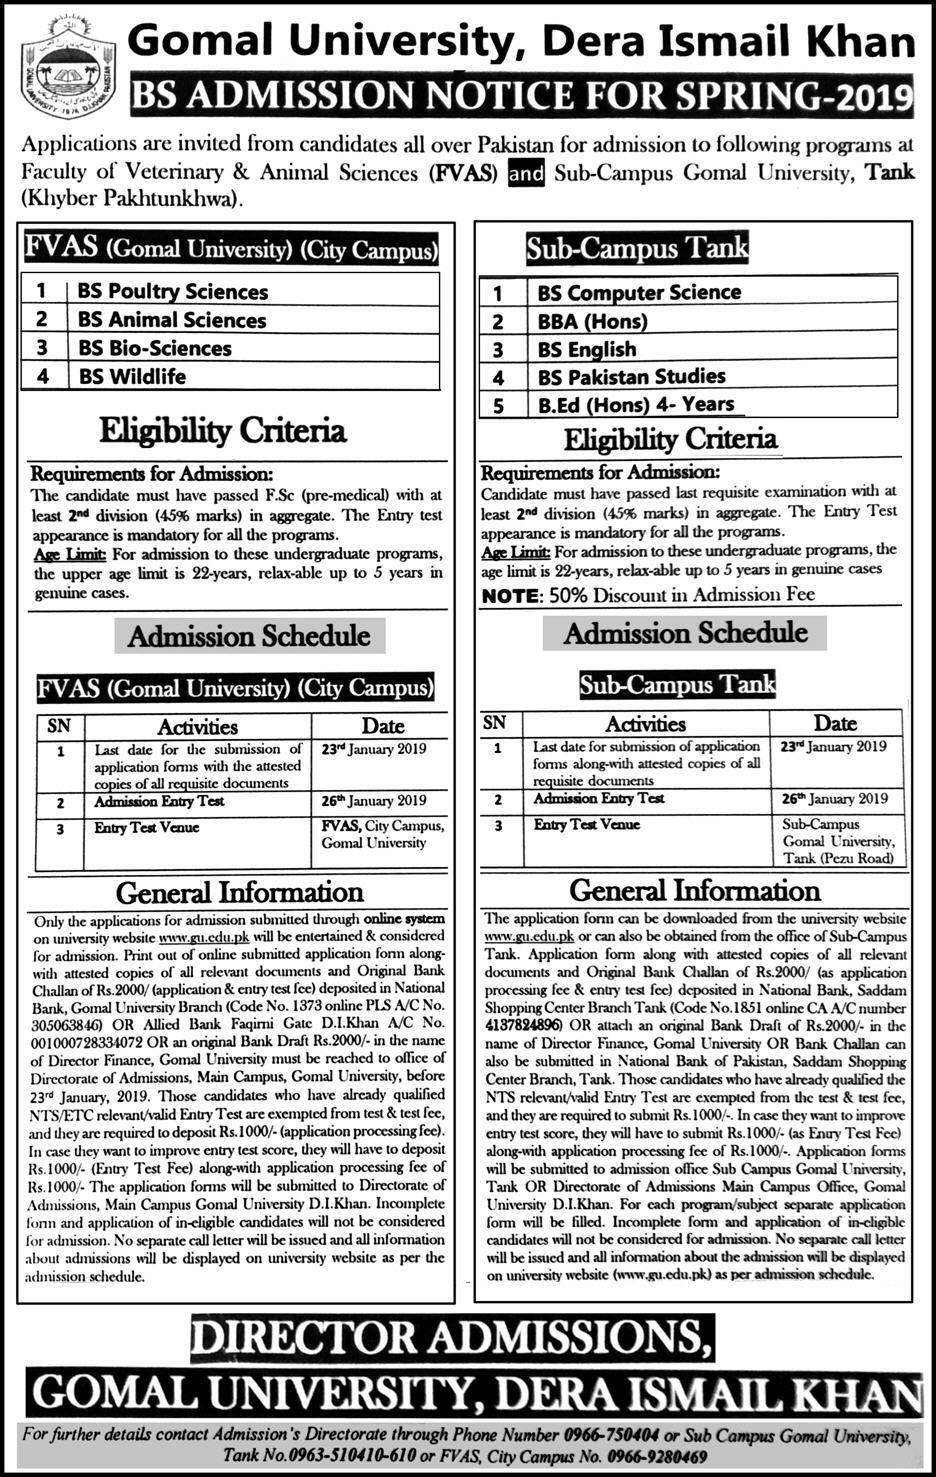 Gomal University DI Khan Admission 2019